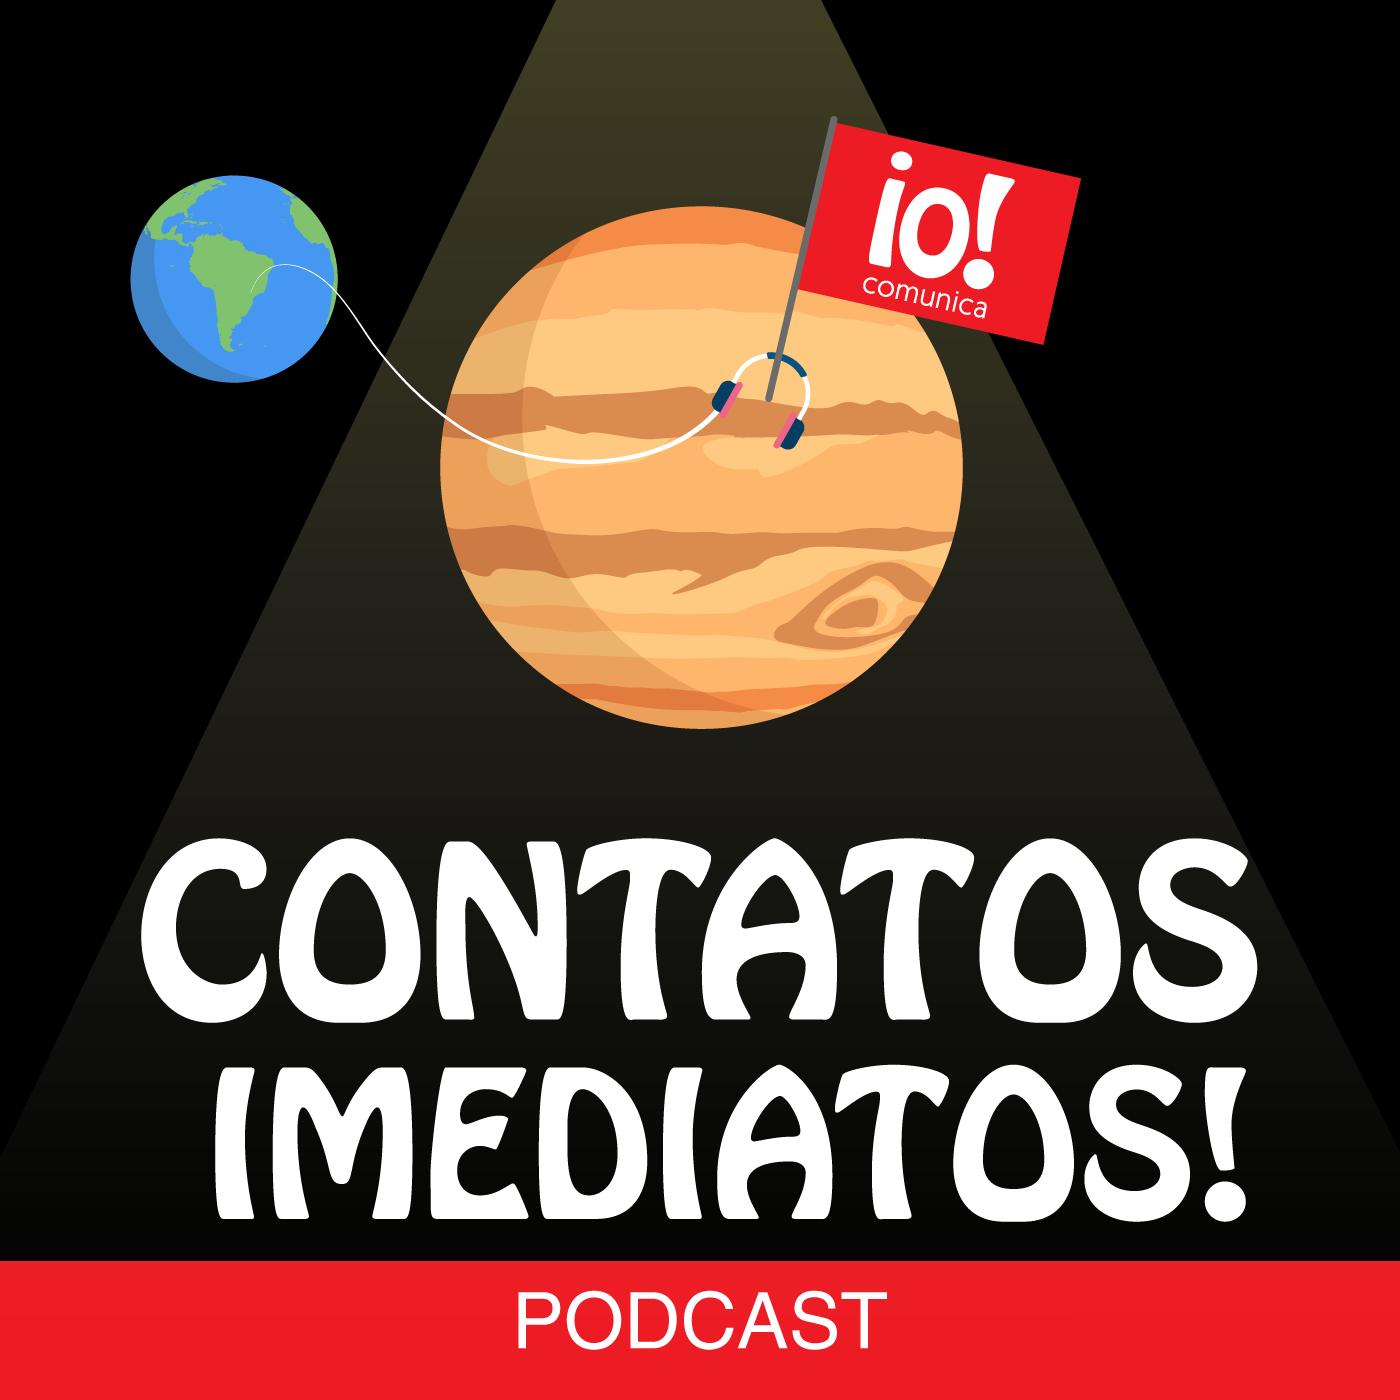 Podcast – Agência io!